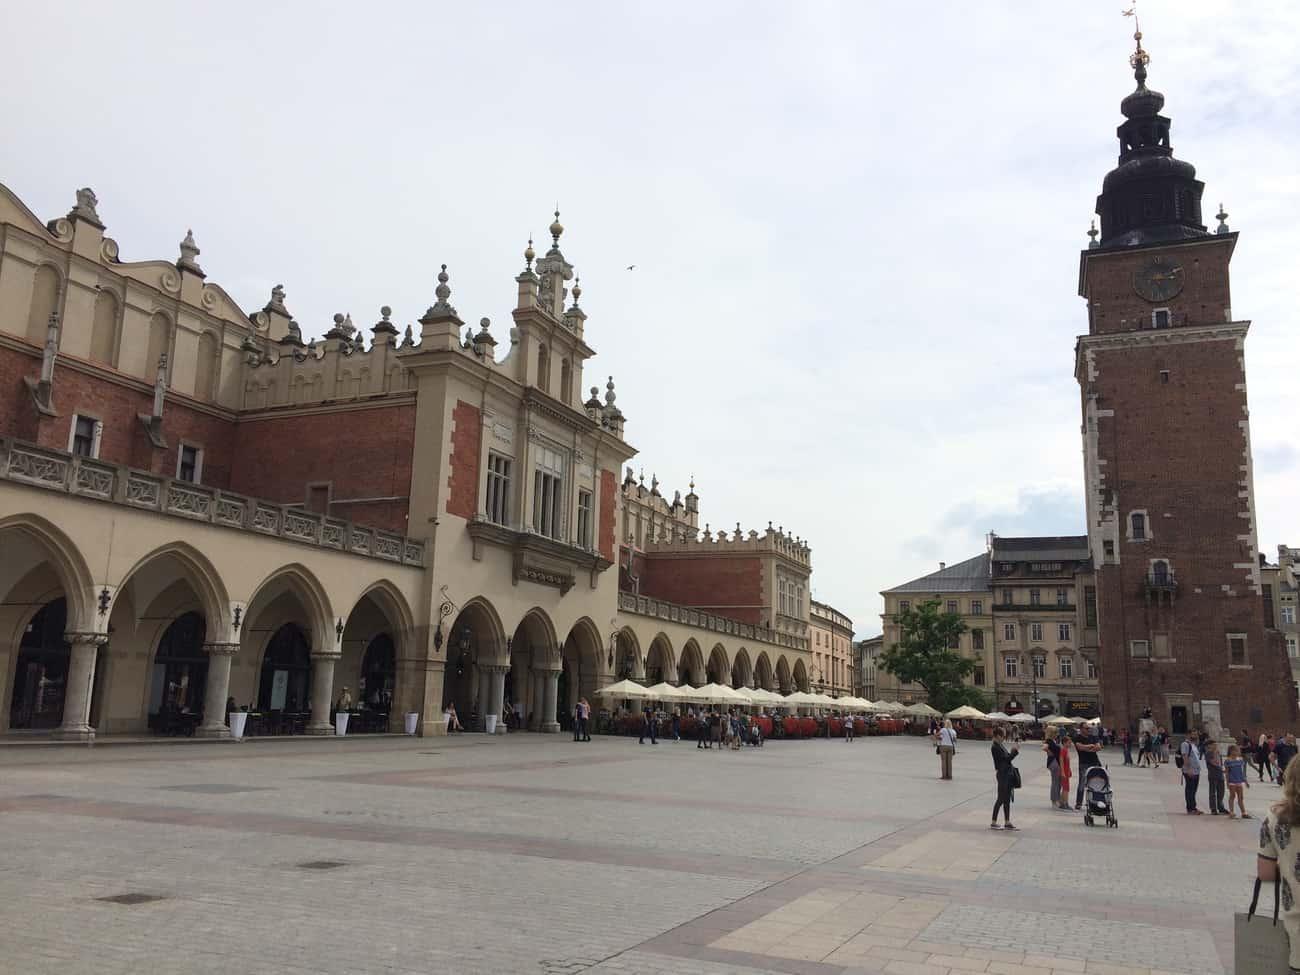 Poland Krakow Cloth Market and Town Hall Tower